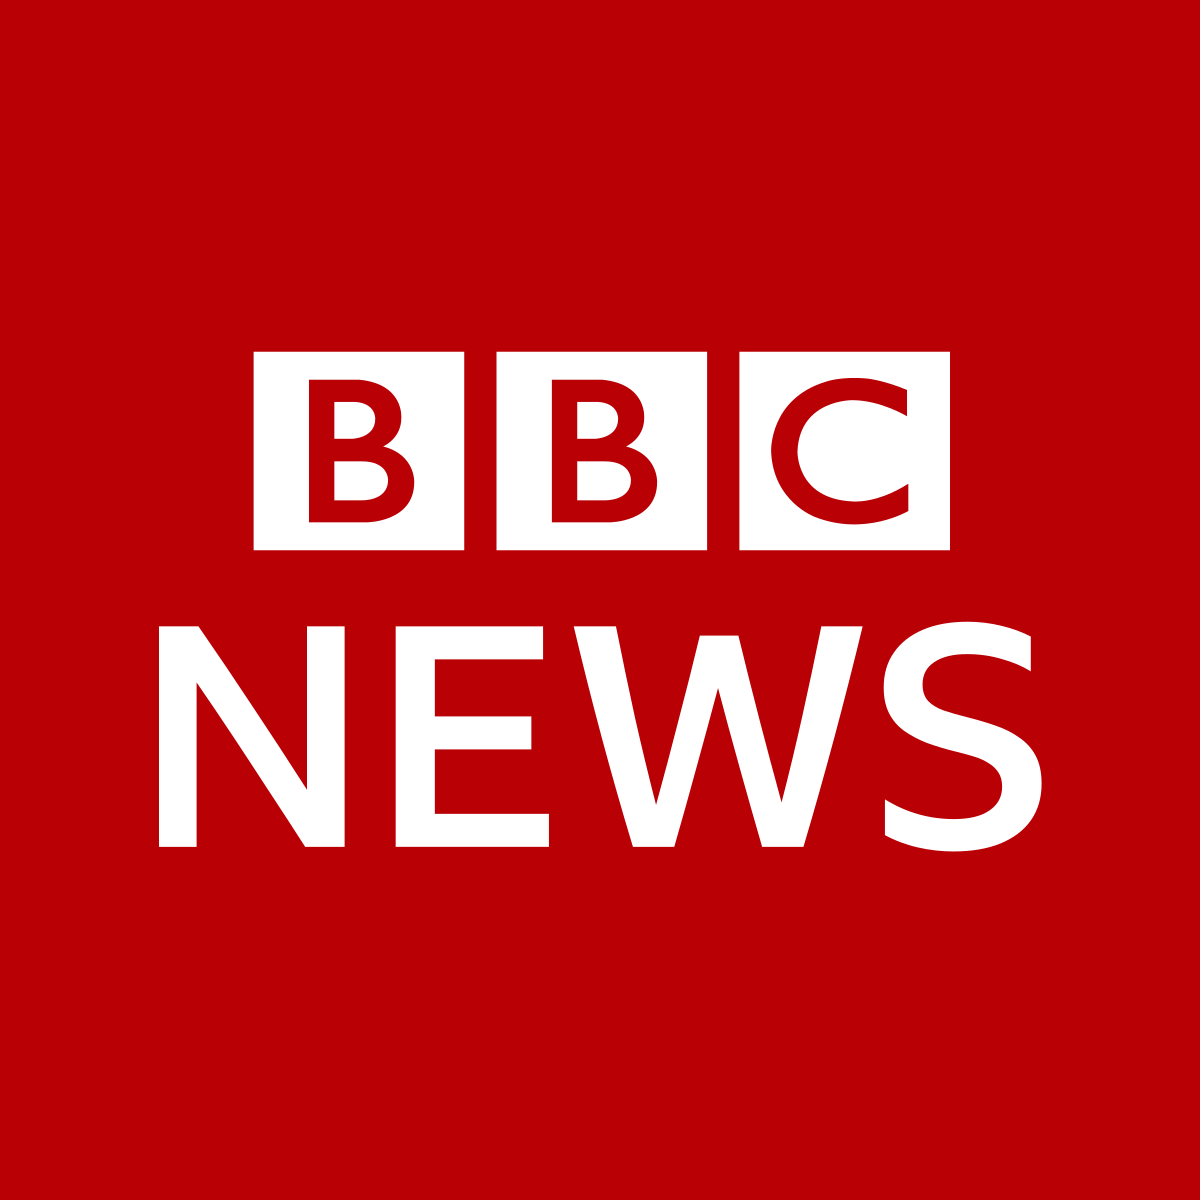 BBC News.